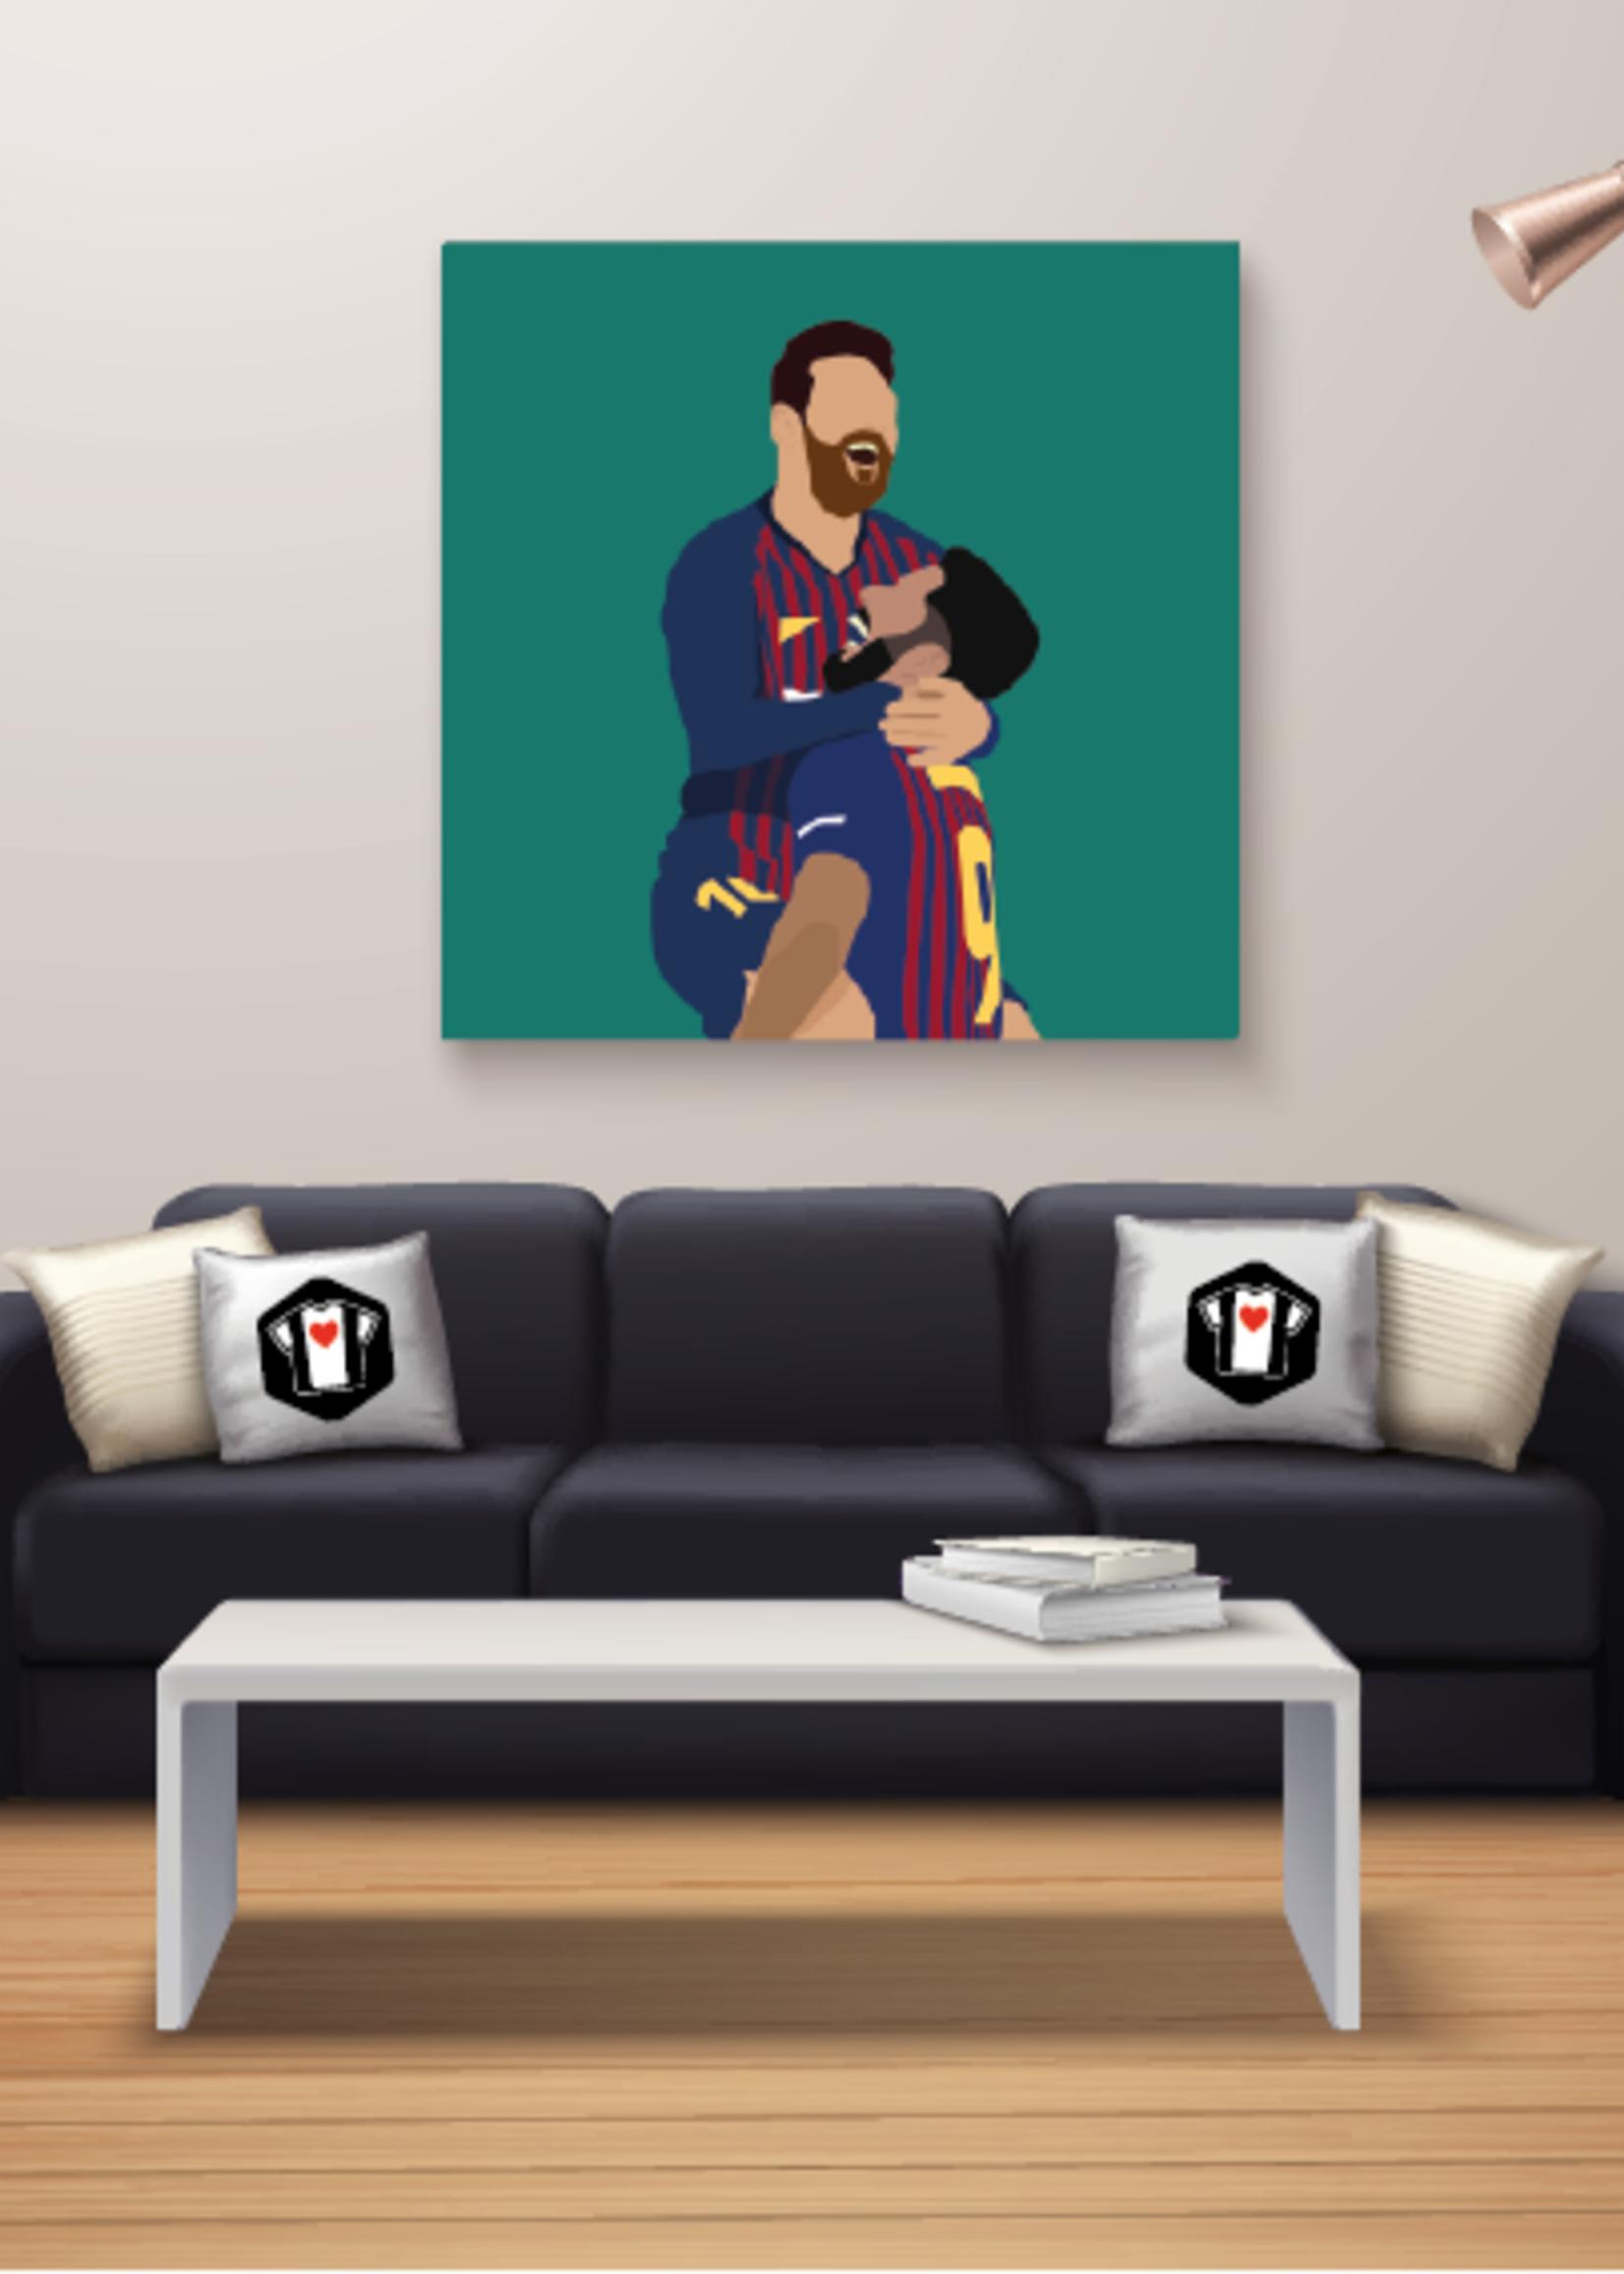 "We Love Football Art ""Gouden duo"" We Love Football Art"